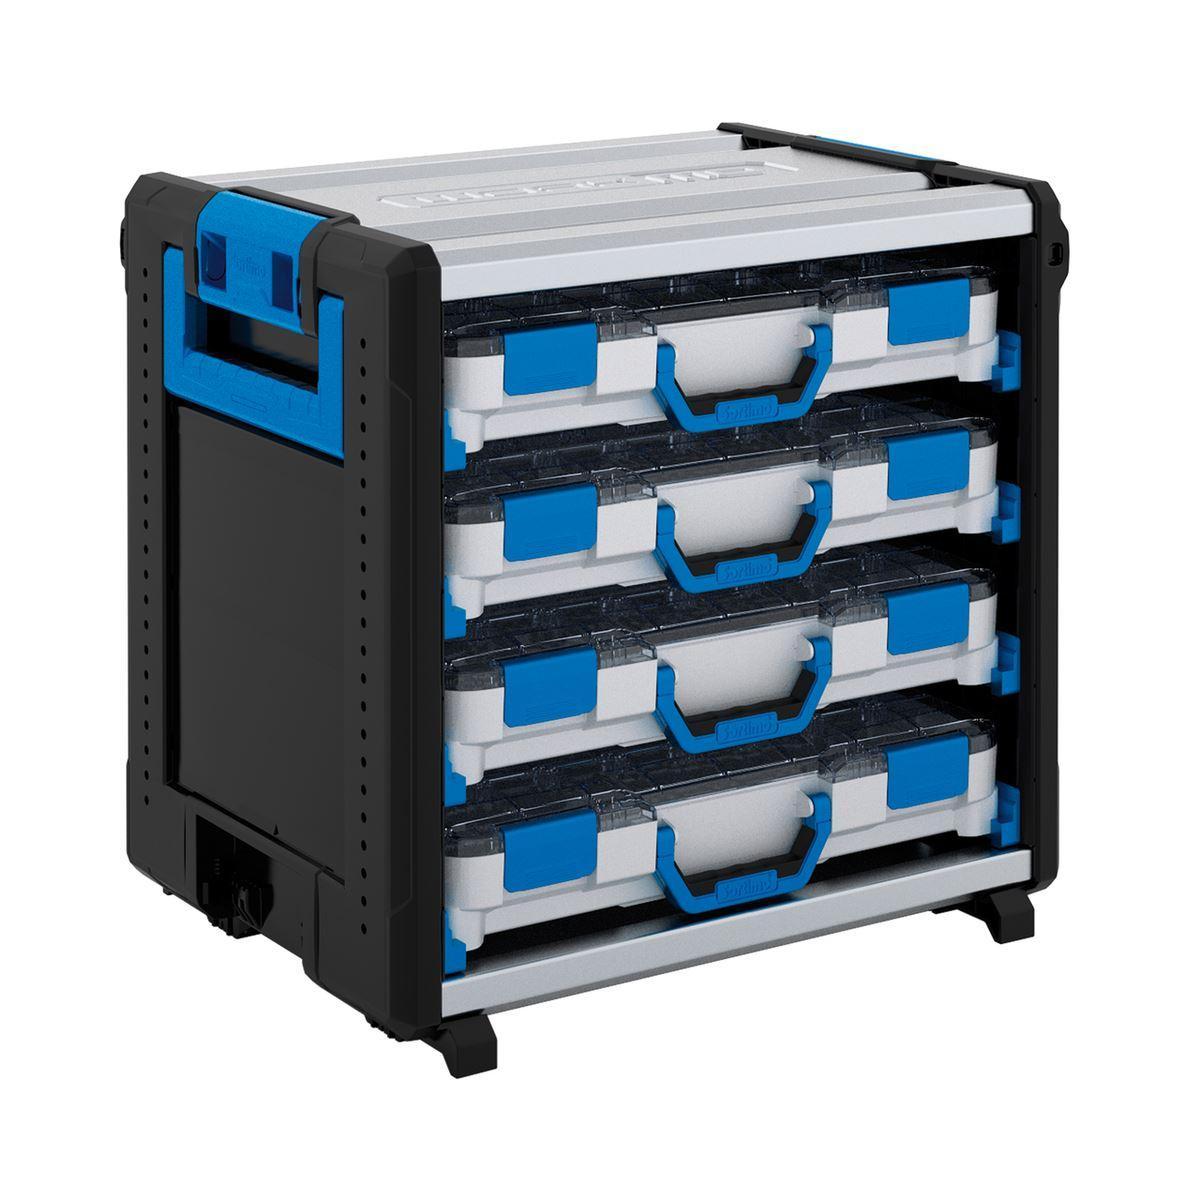 WO 24-500 STB 4TB H - WokMo modul s koľajnicami a BOXXami